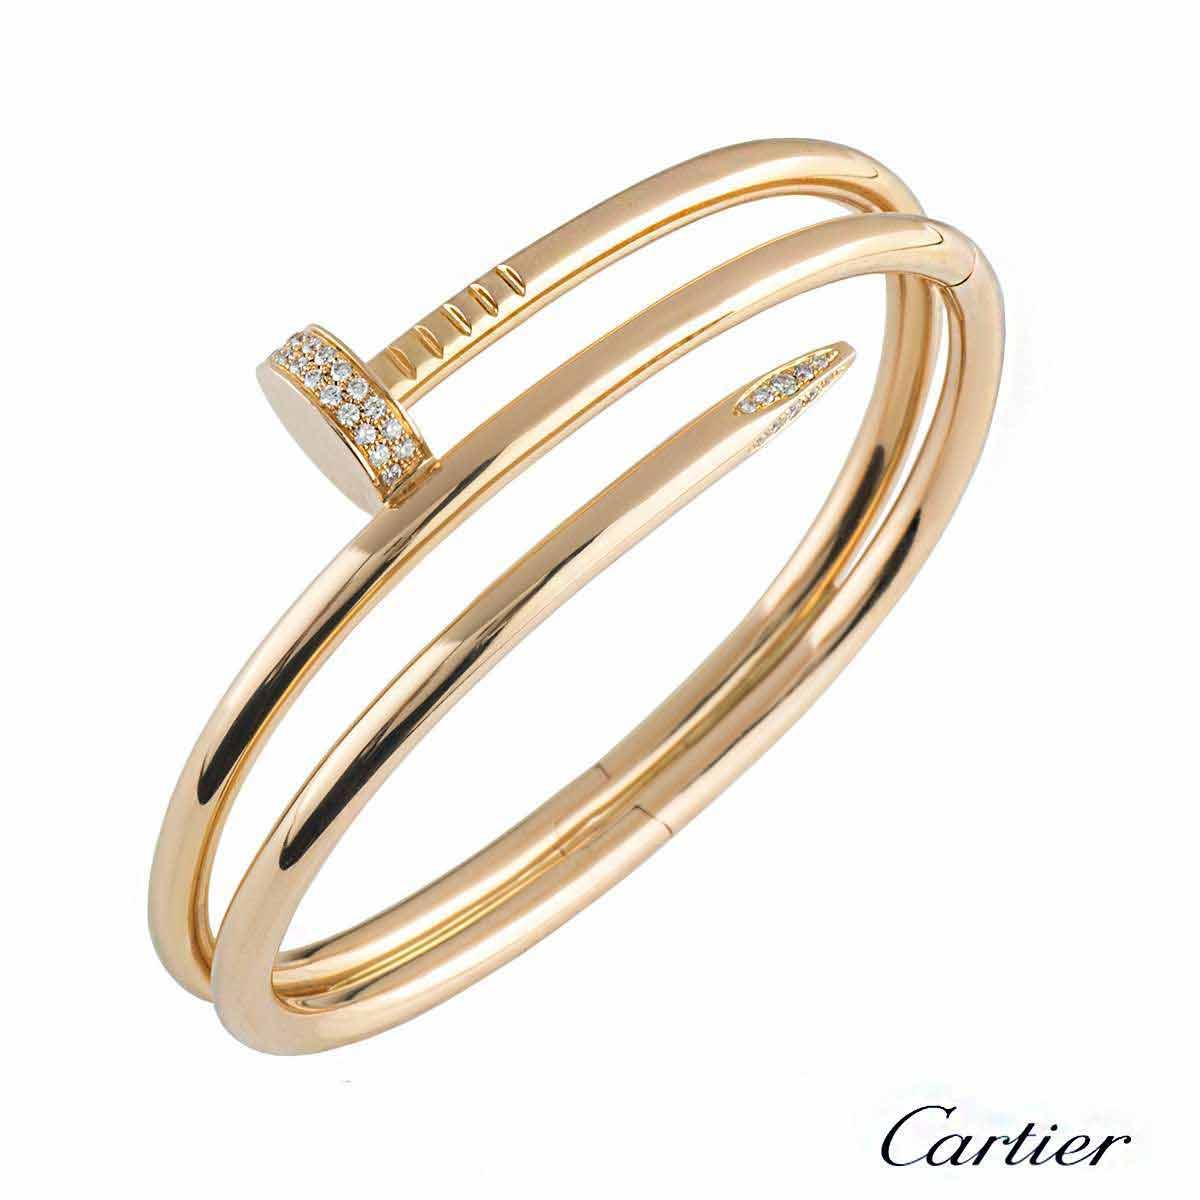 Cartier Juste Un Clou Diamond Bracelet Size 16 N6708416